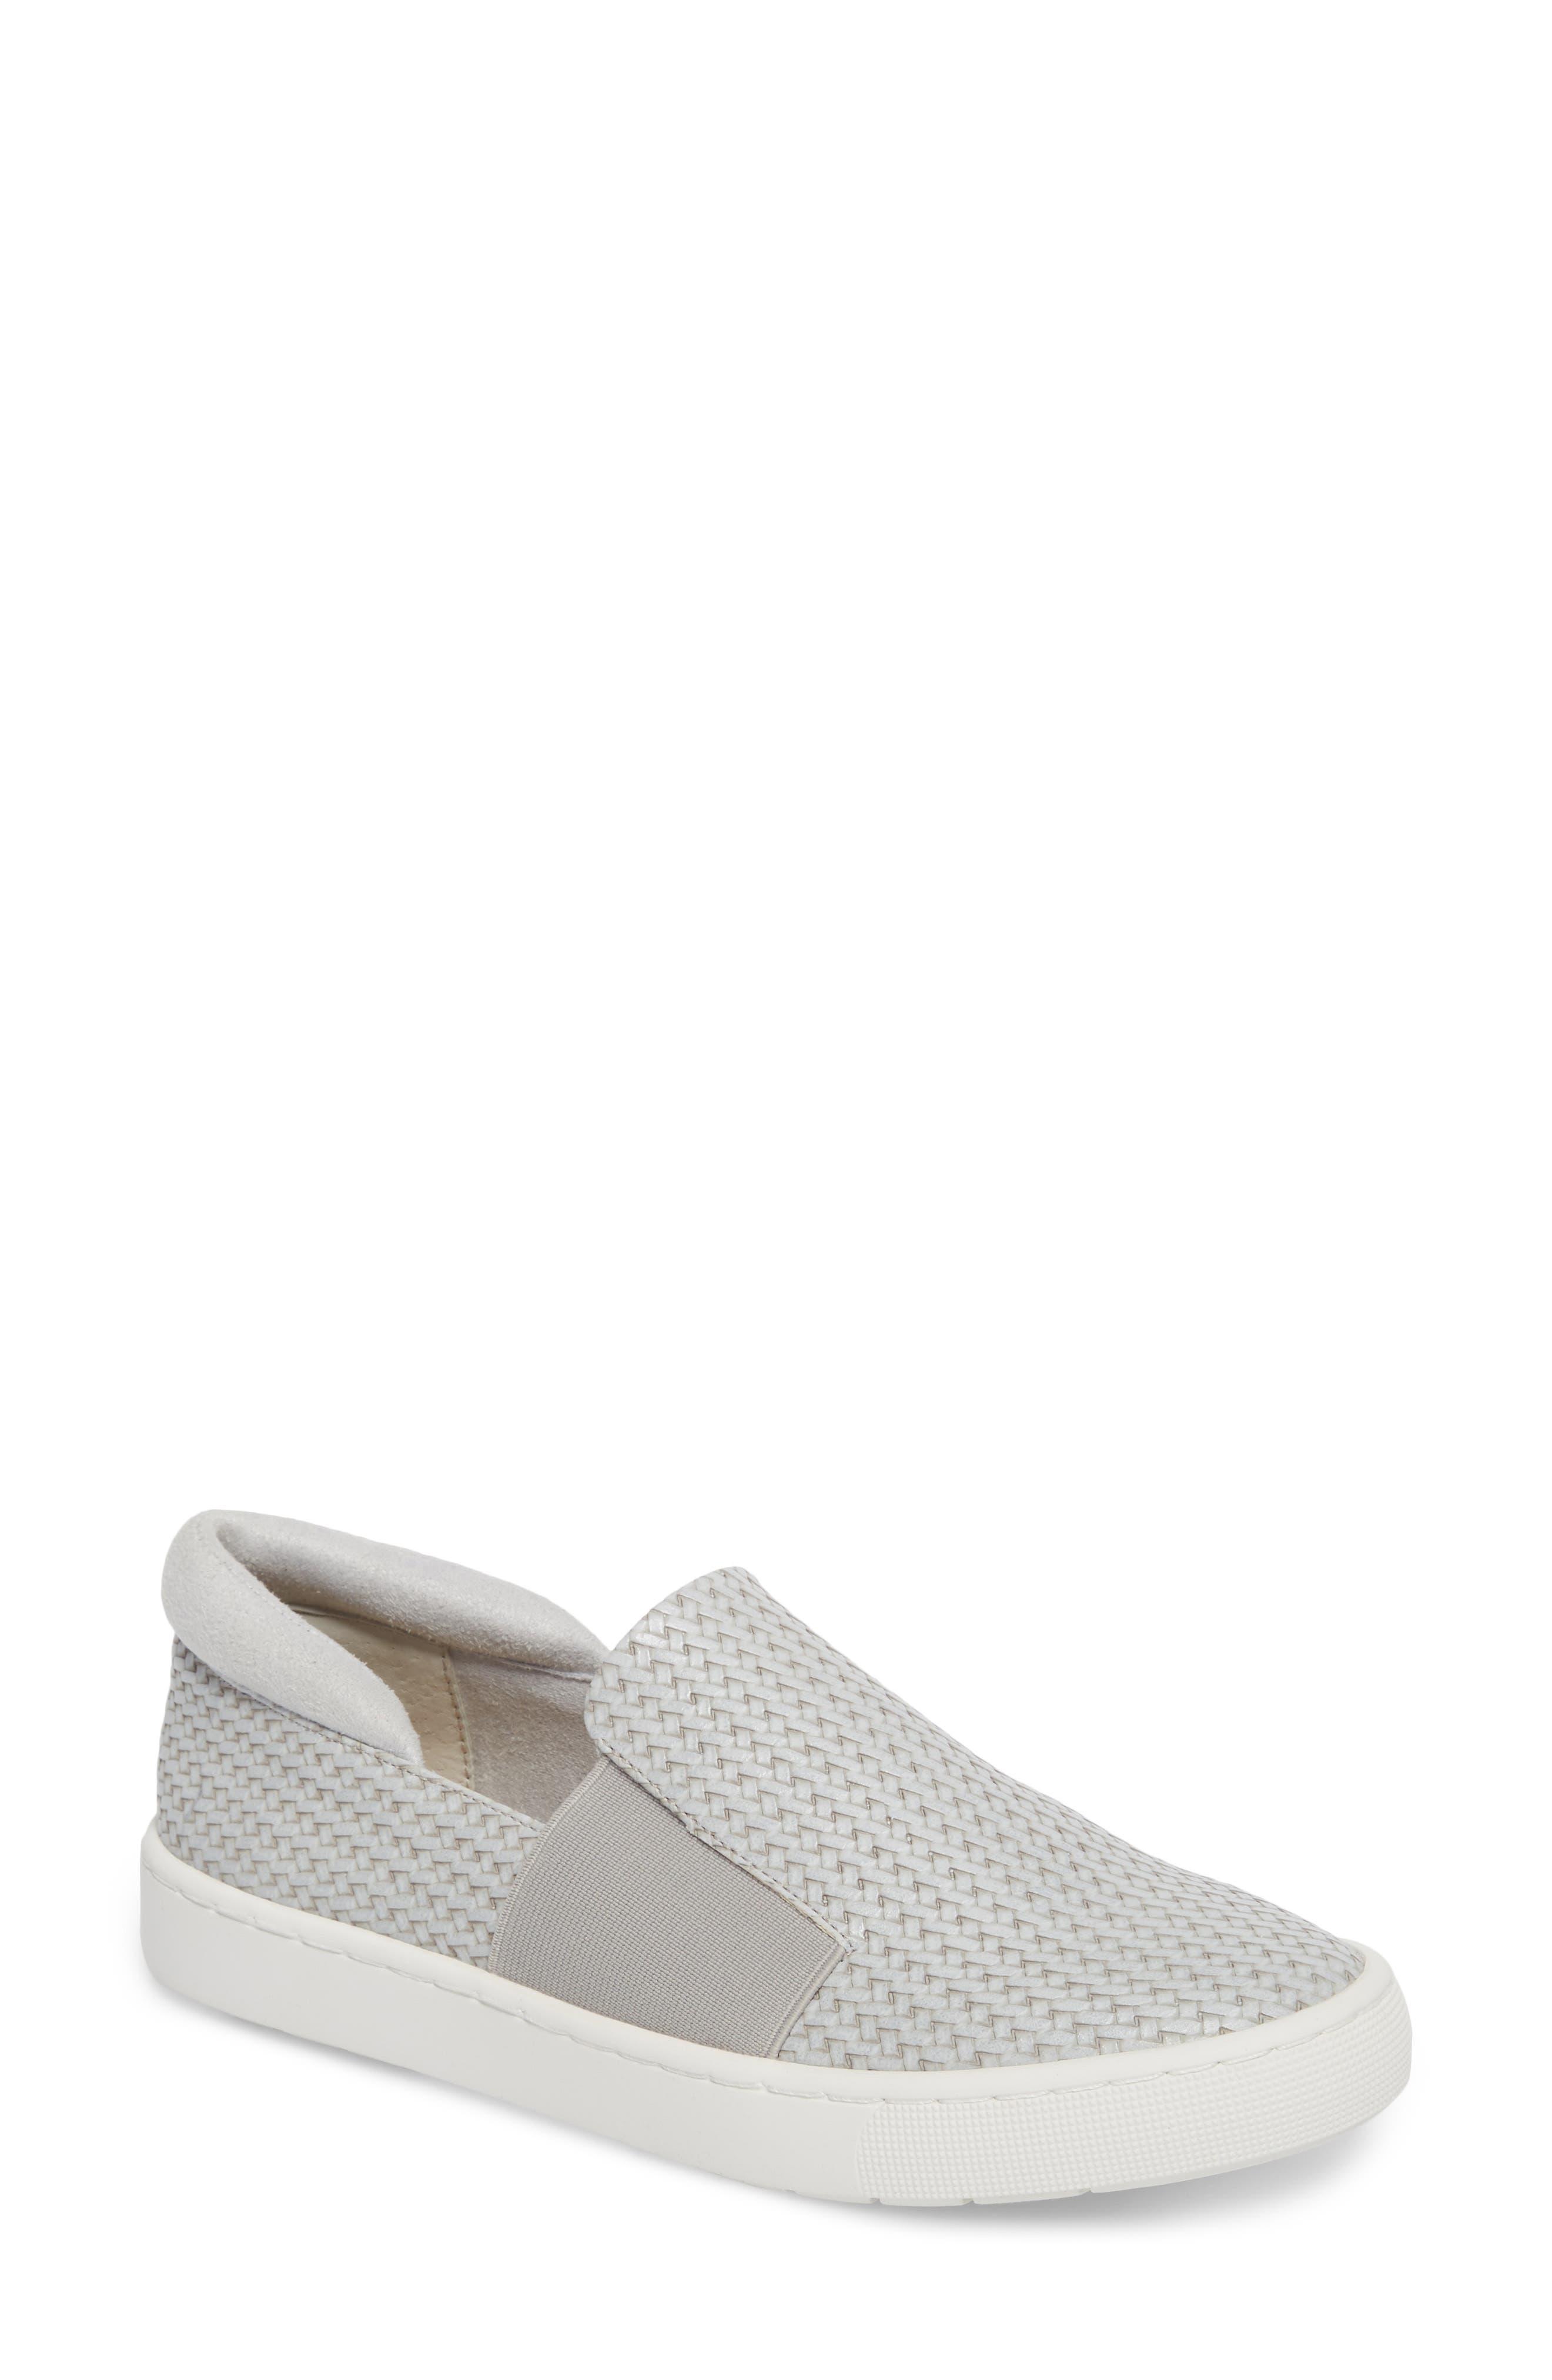 BELLA VITA Ramp II Slip-On Sneaker, Main, color, LIGHT GREY FABRIC